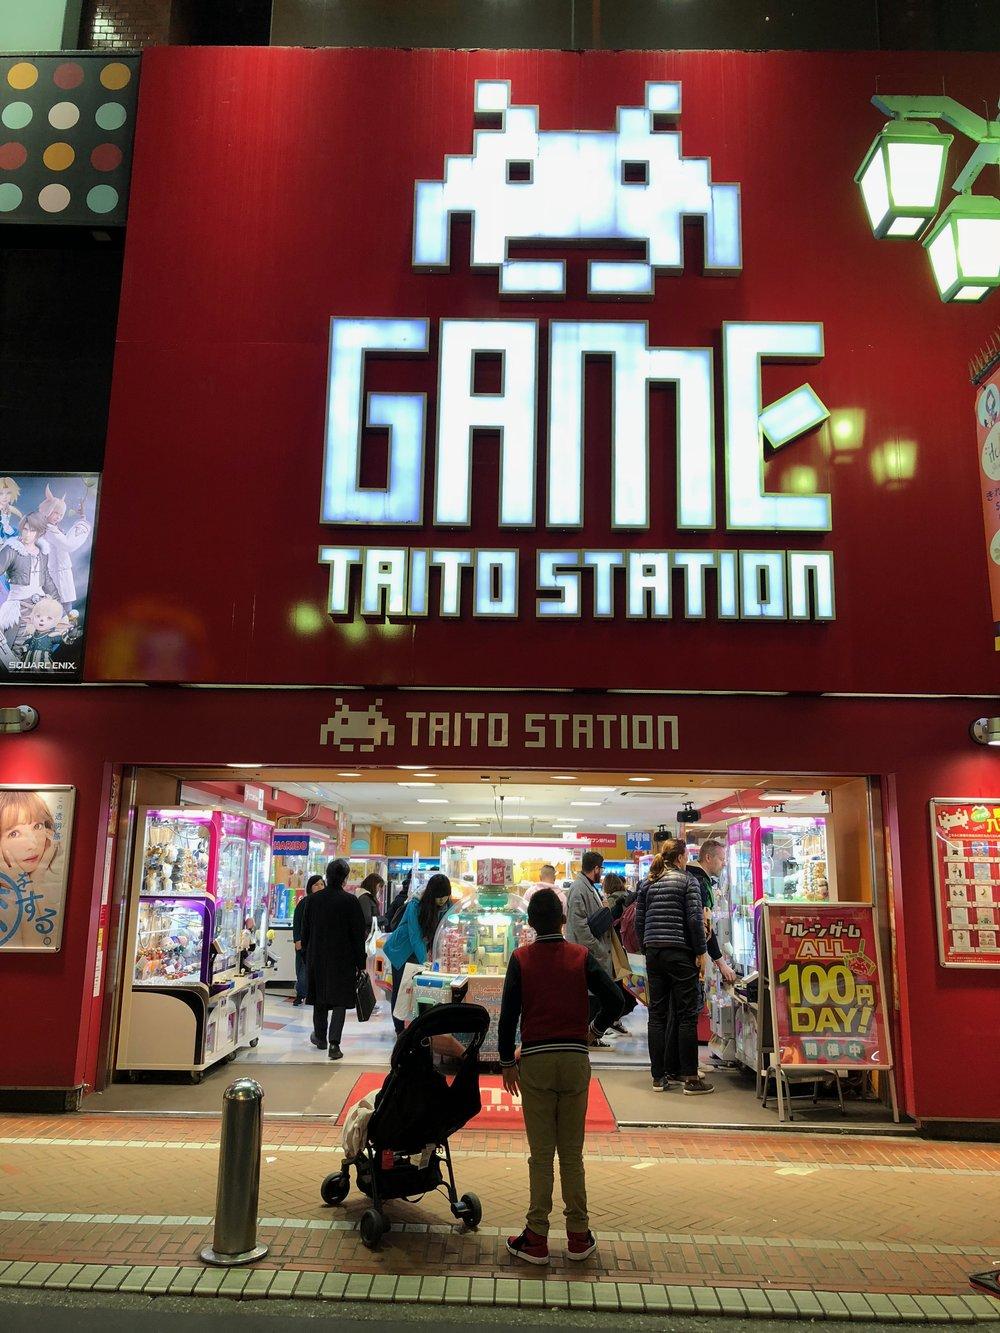 Tokyo Game Station on meethaha.com